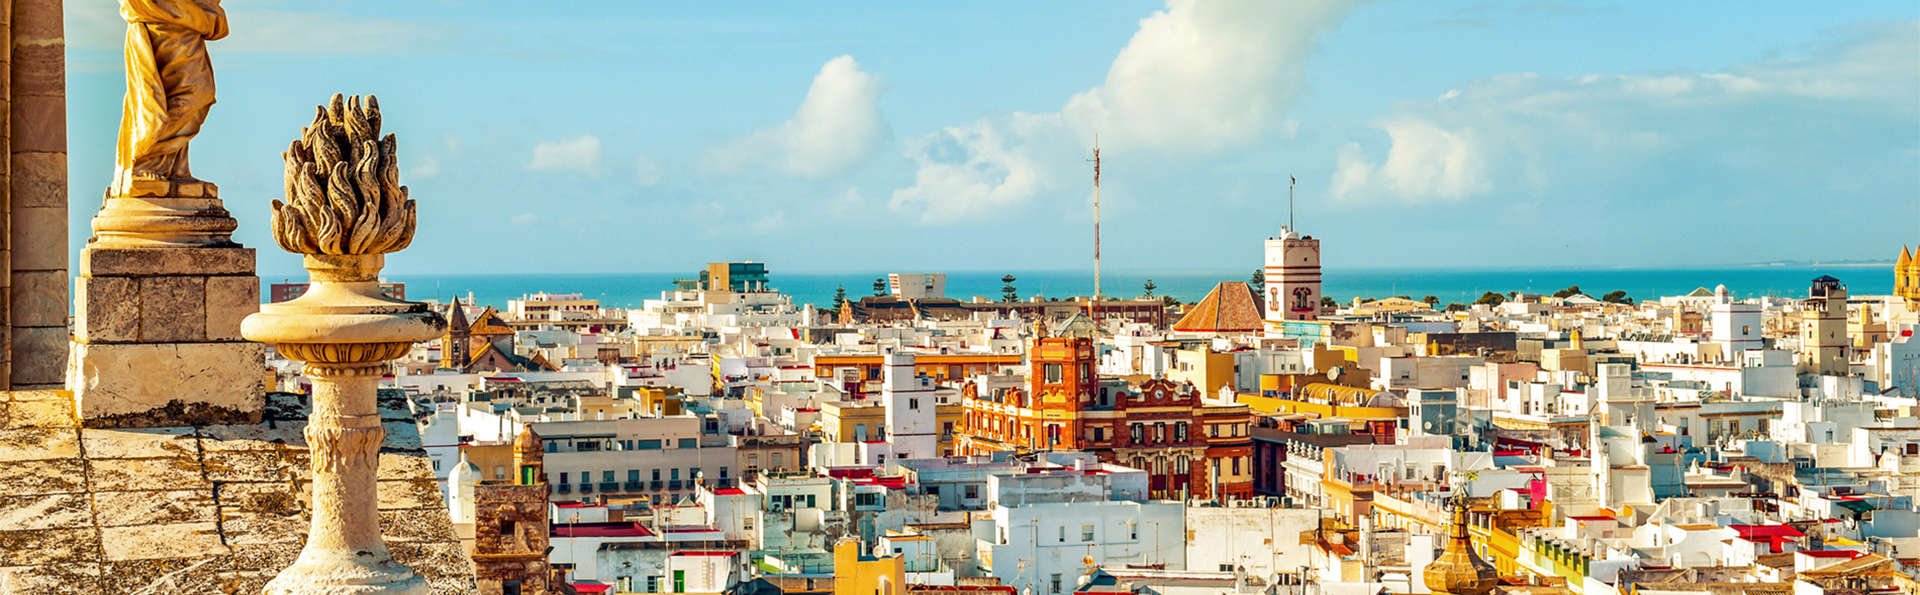 Casa Palacio Cádiz - EDIT_Destination2.jpg